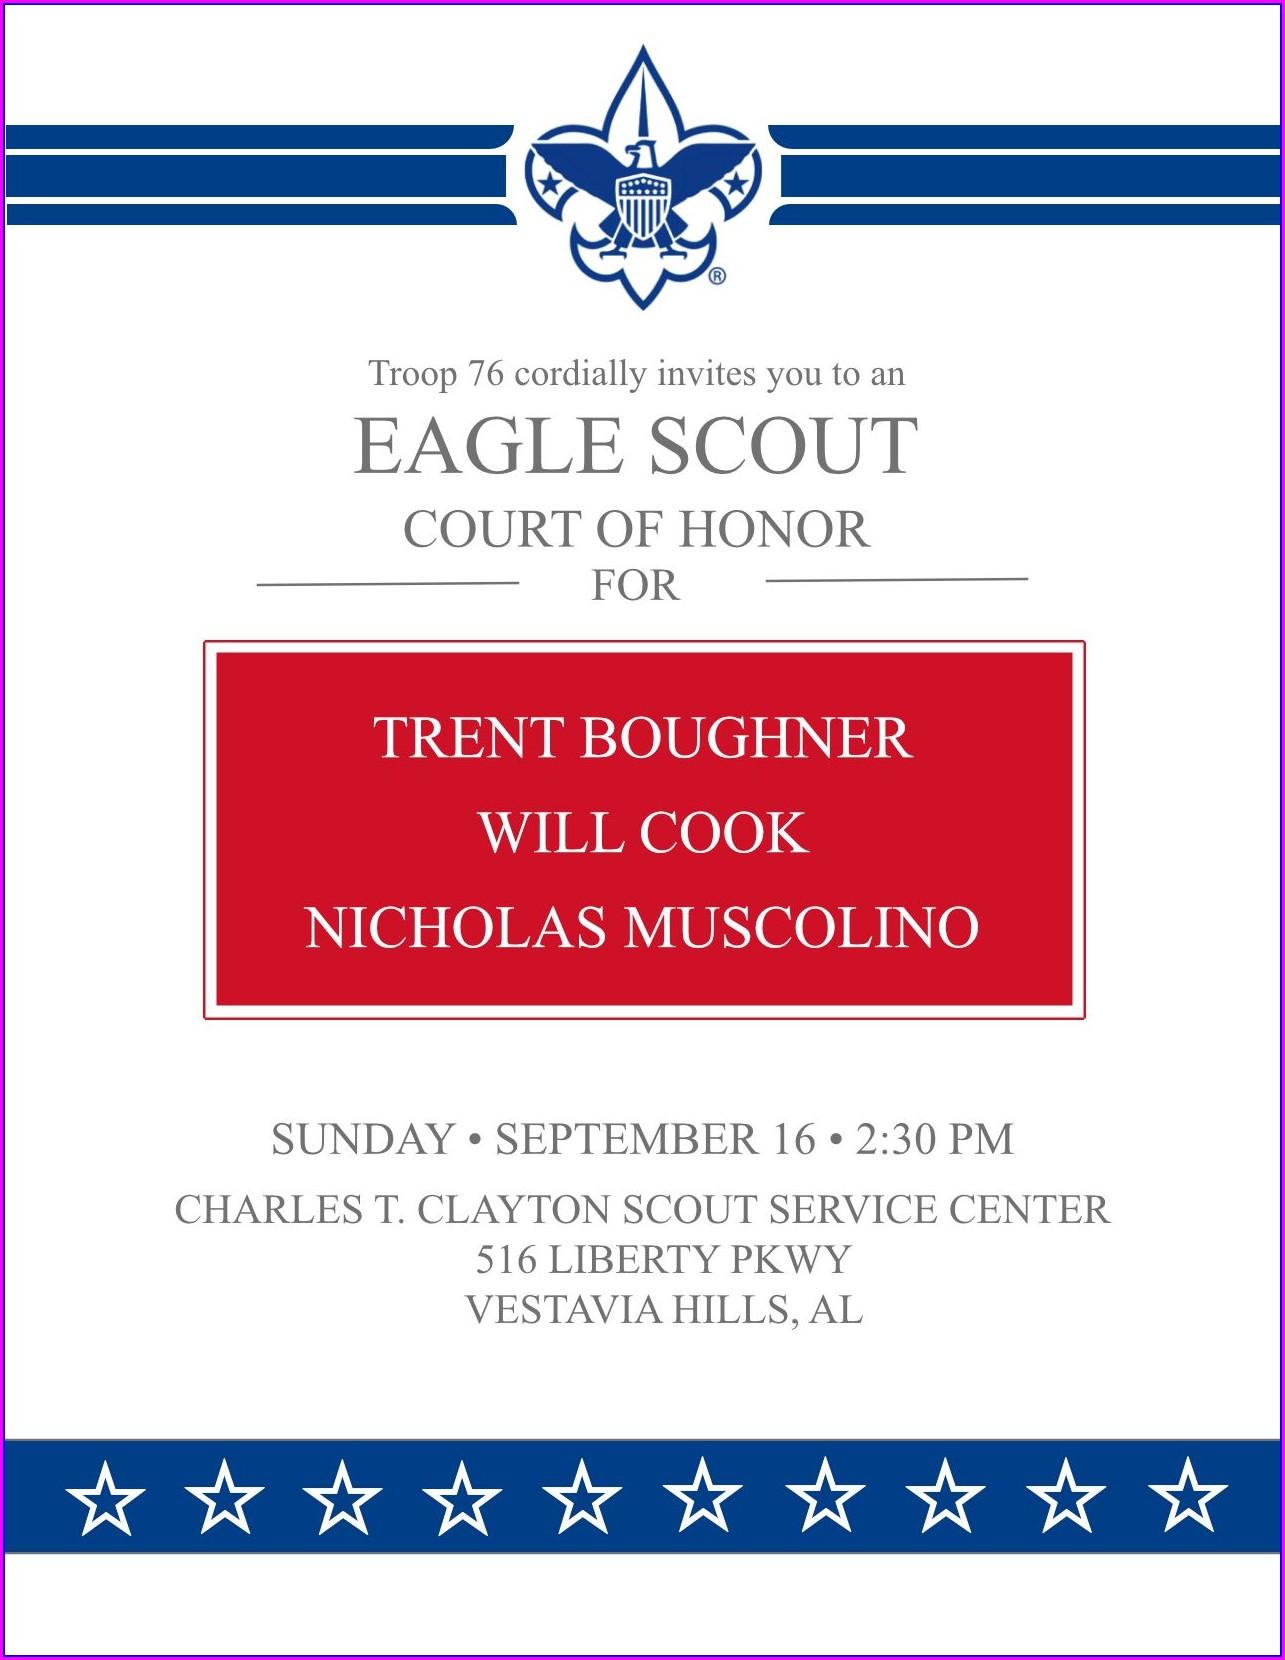 Eagle Court Of Honor Invitation Template